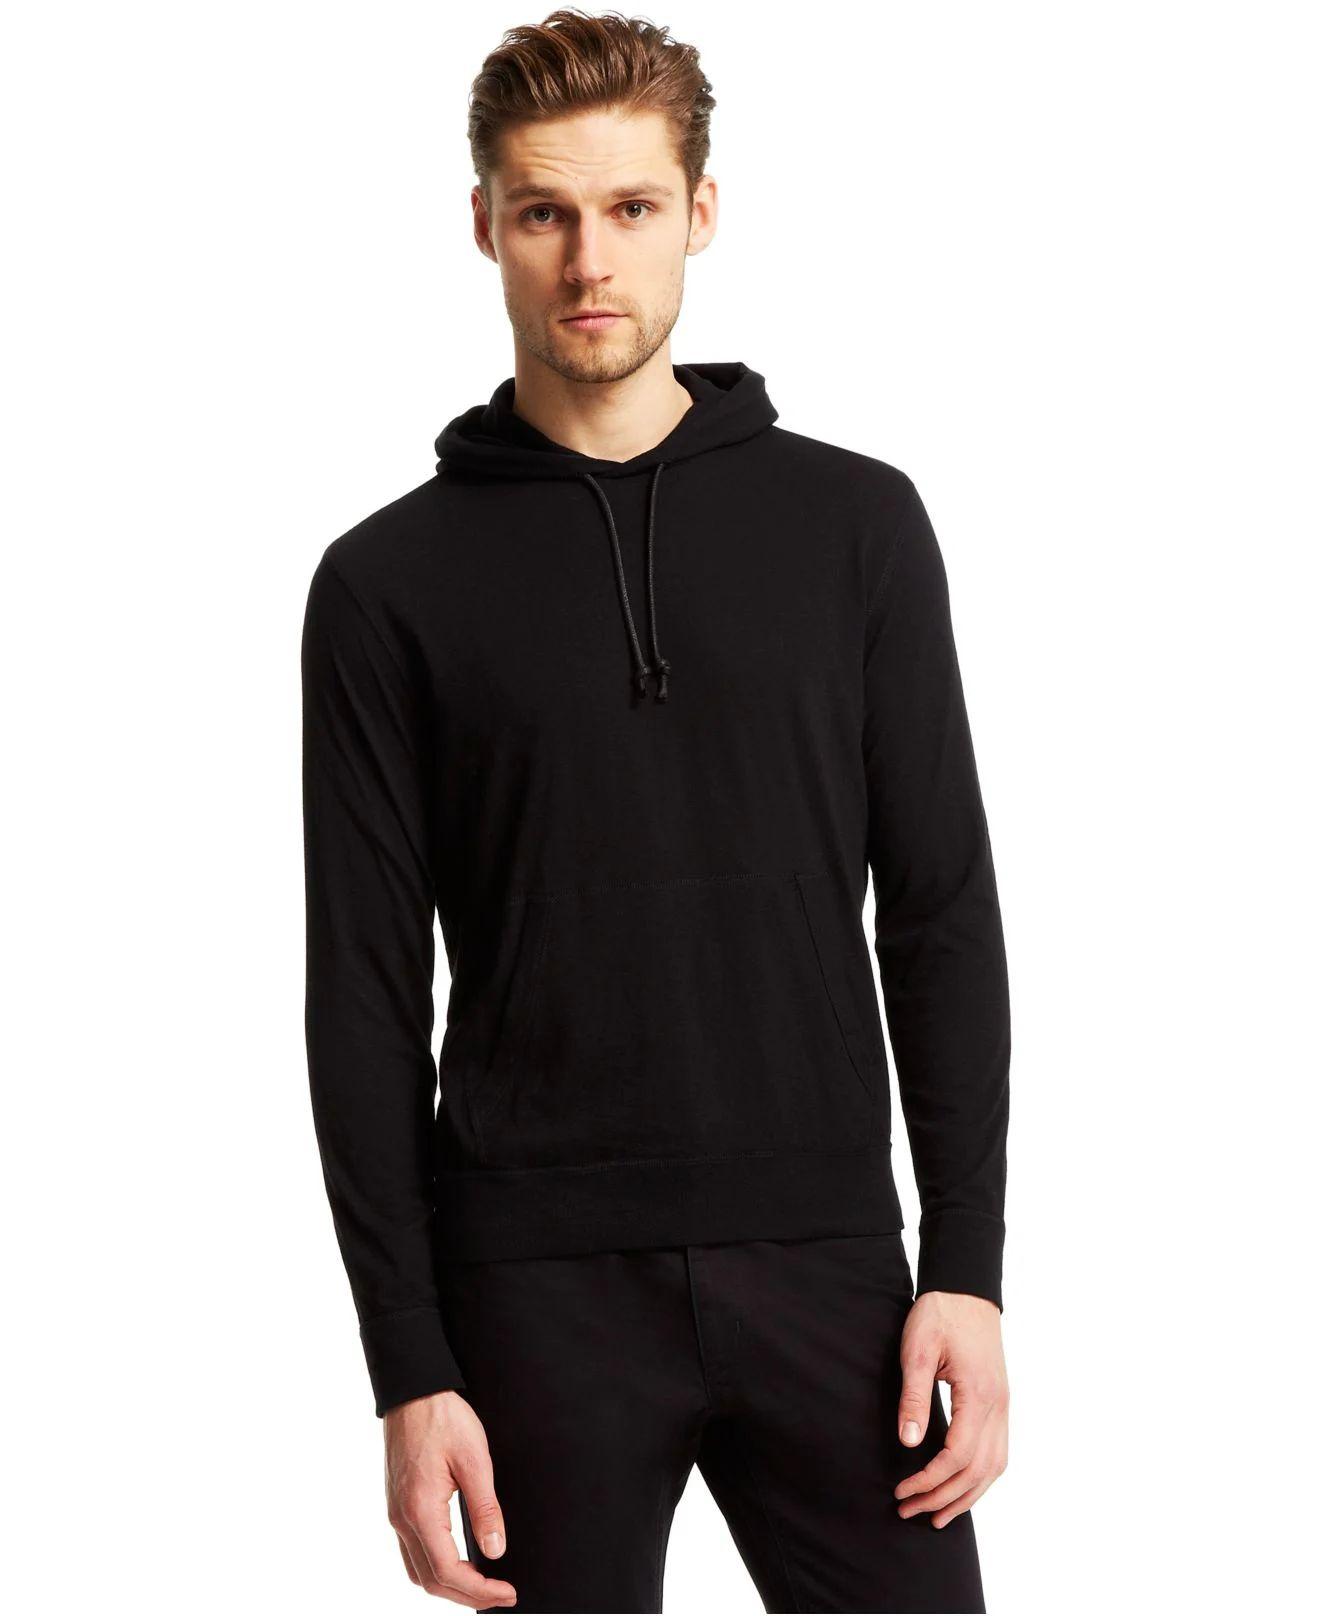 Black t shirt hoodie